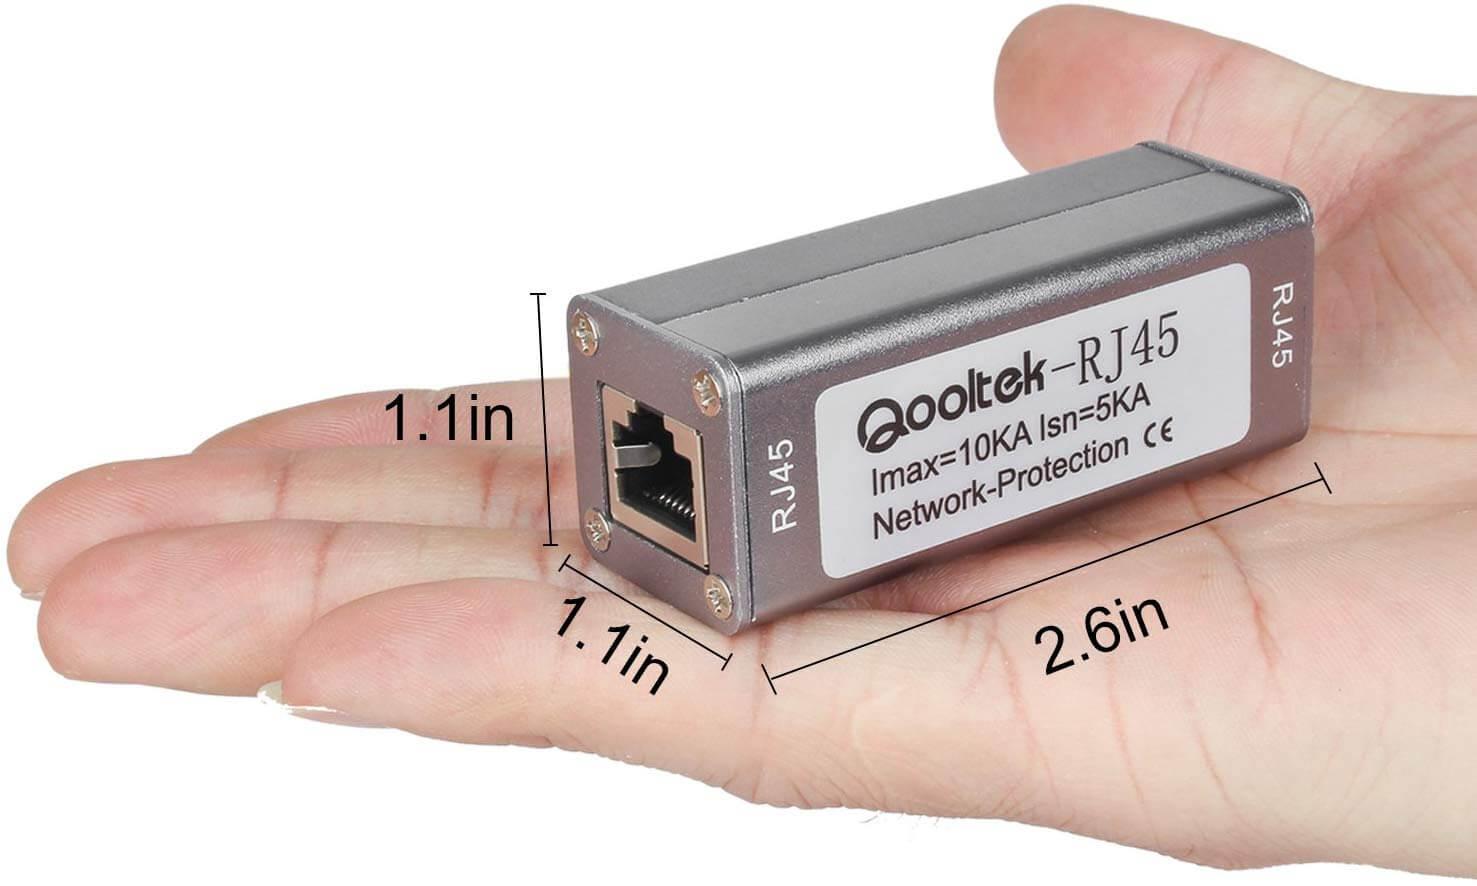 Qooltek ST-NET Ethernet Surge Protector